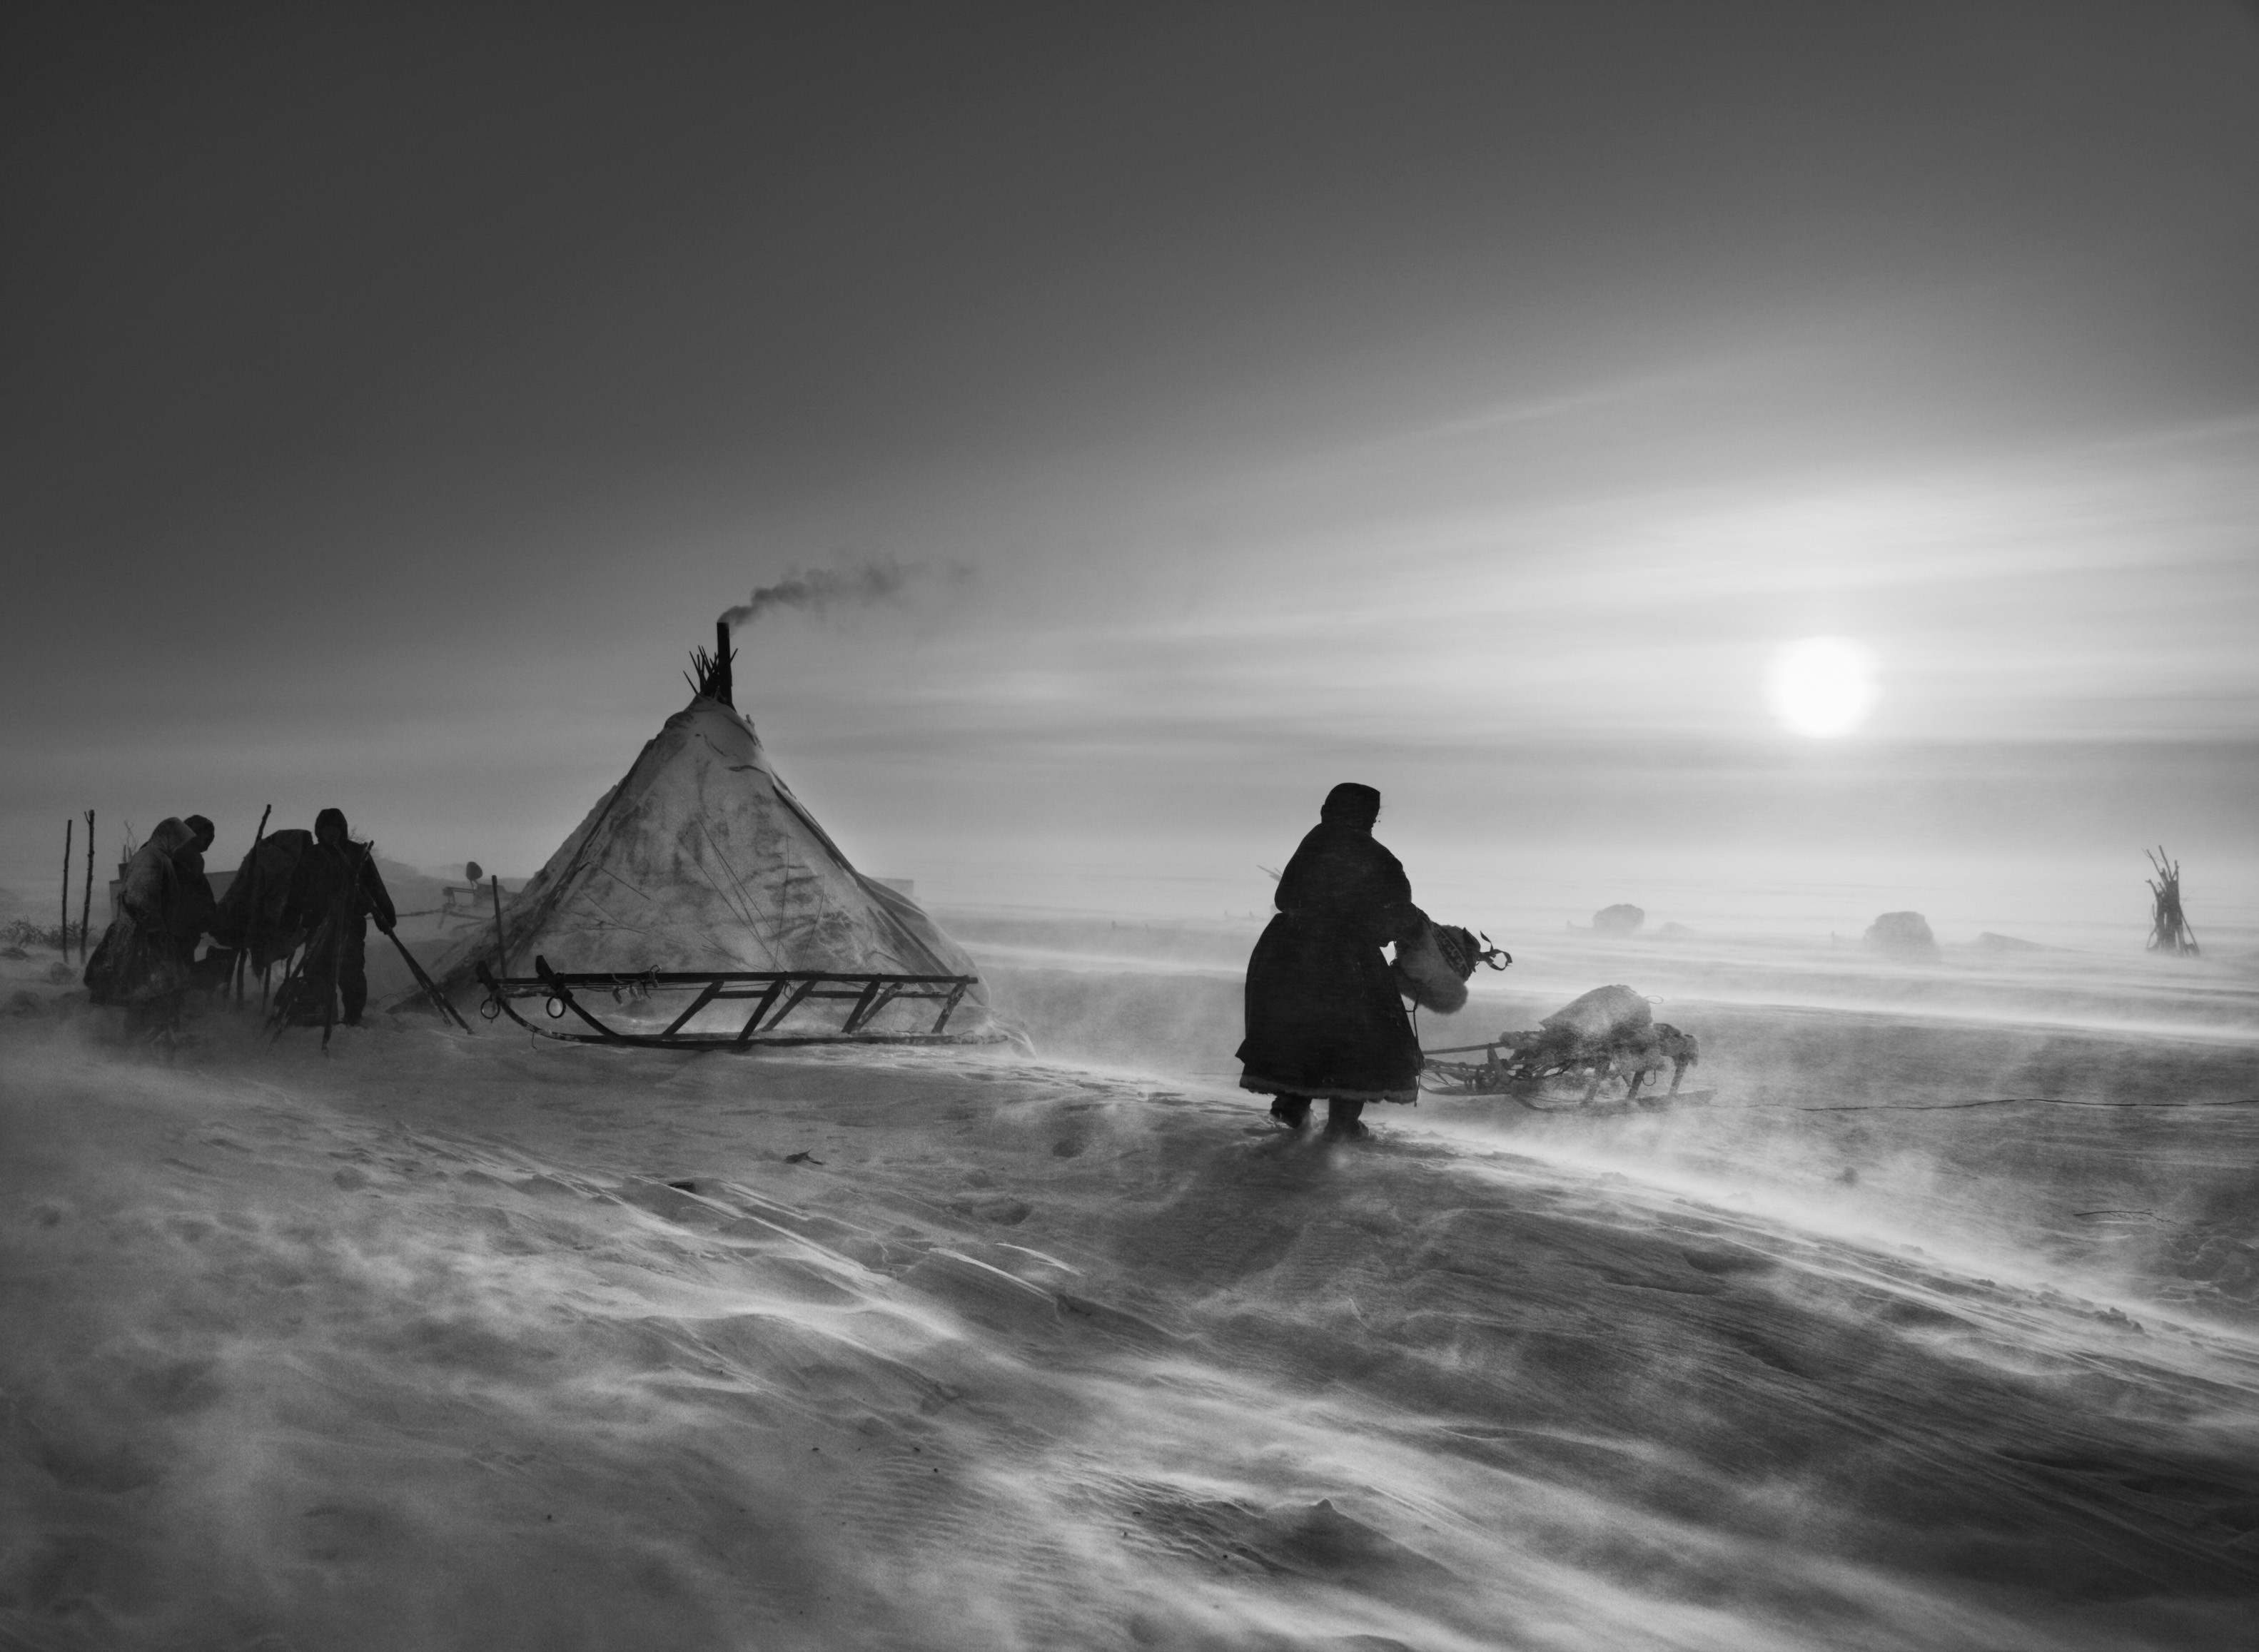 Ямал, Сибирь, Россия, 2011. Автор Себастьян Сальгадо